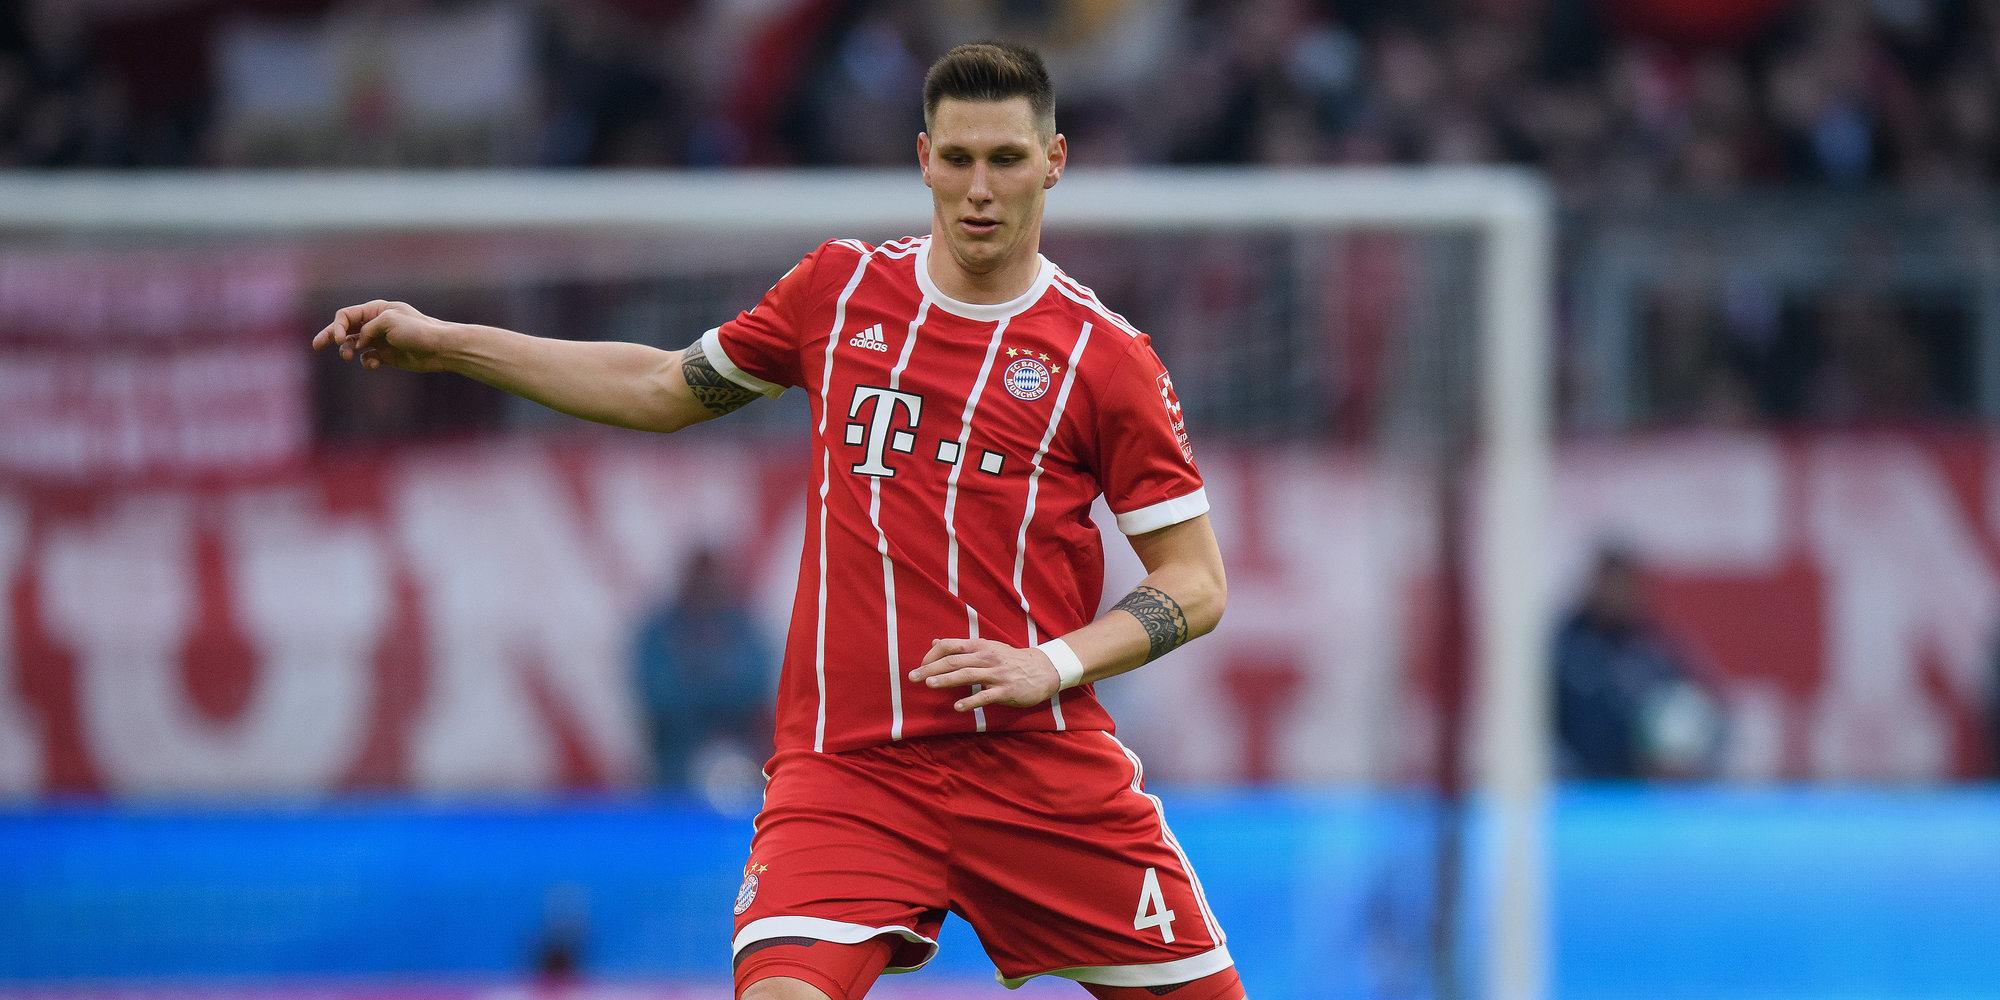 Бавария News: «Бавария» обыграла «Вердер», одержав 9-ю победу в десяти